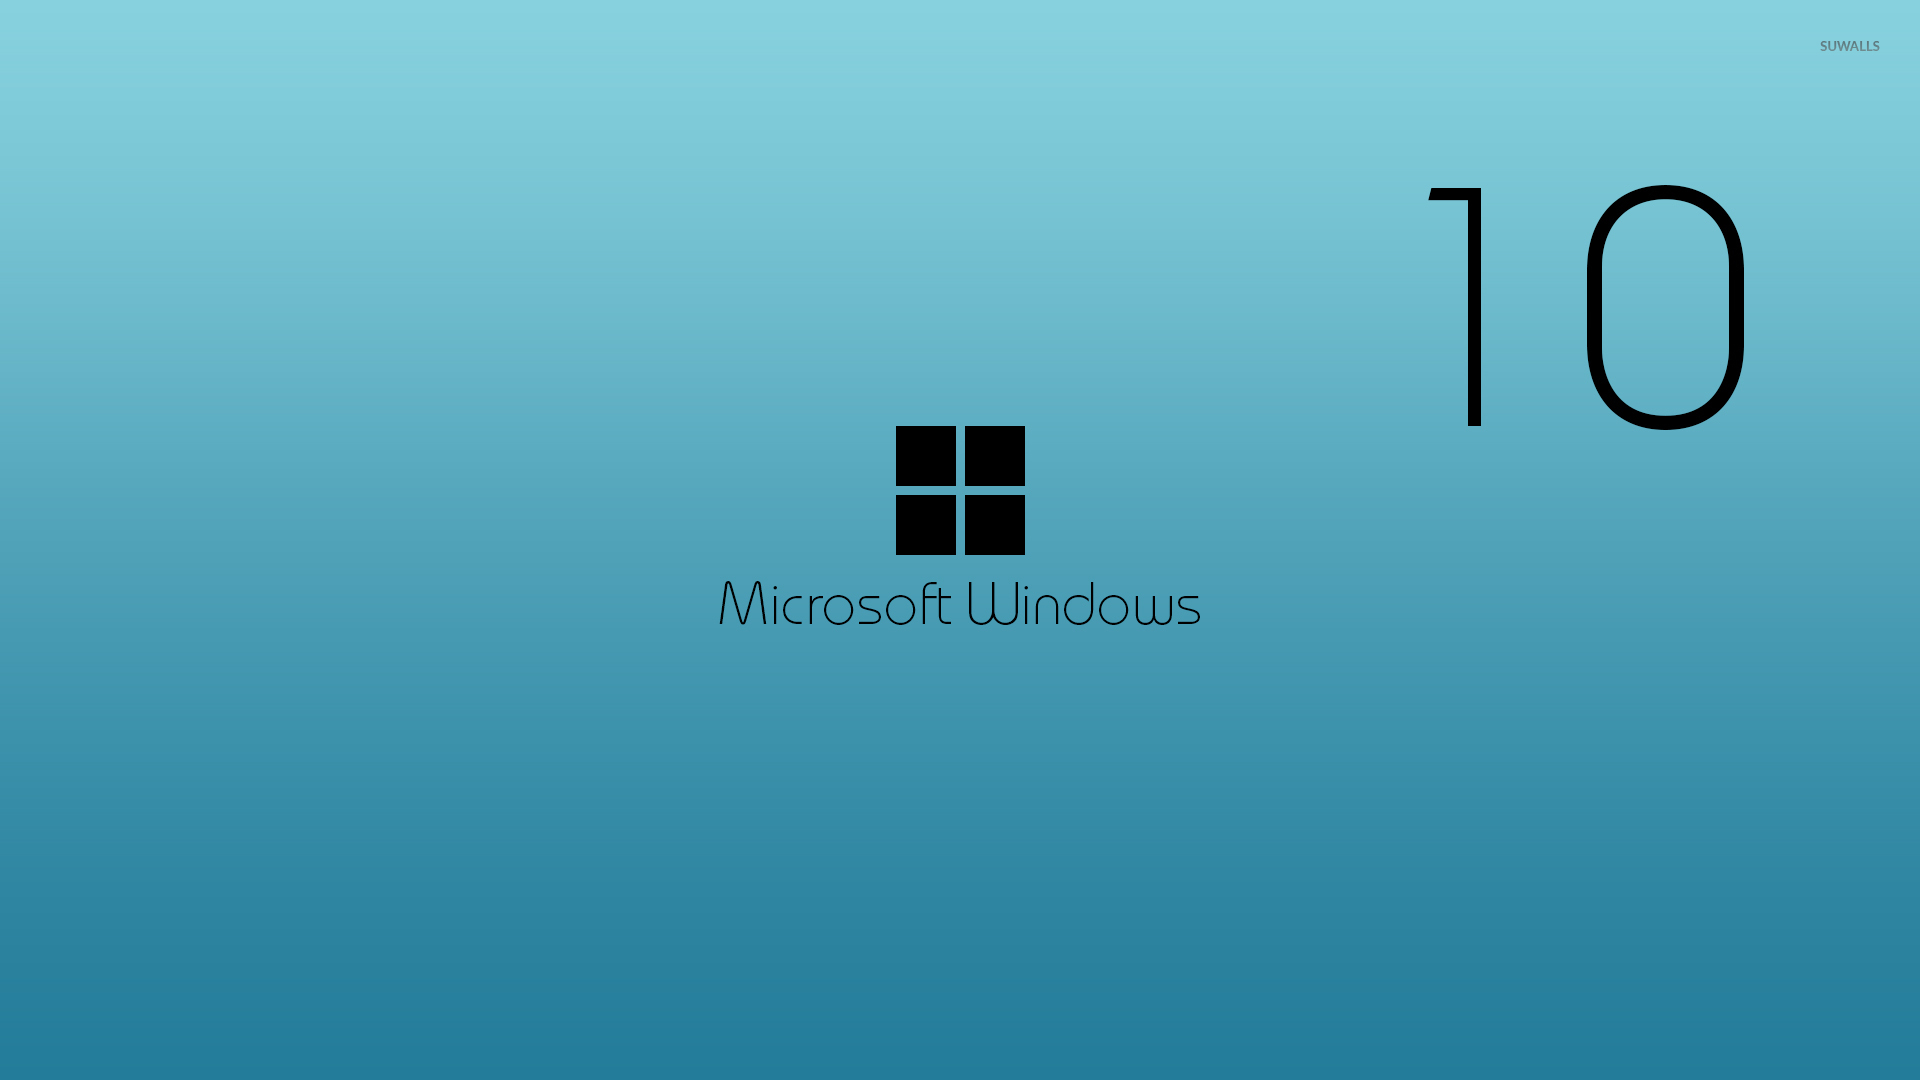 Black Windows 10 wallpaper - Computer wallpapers - #49873